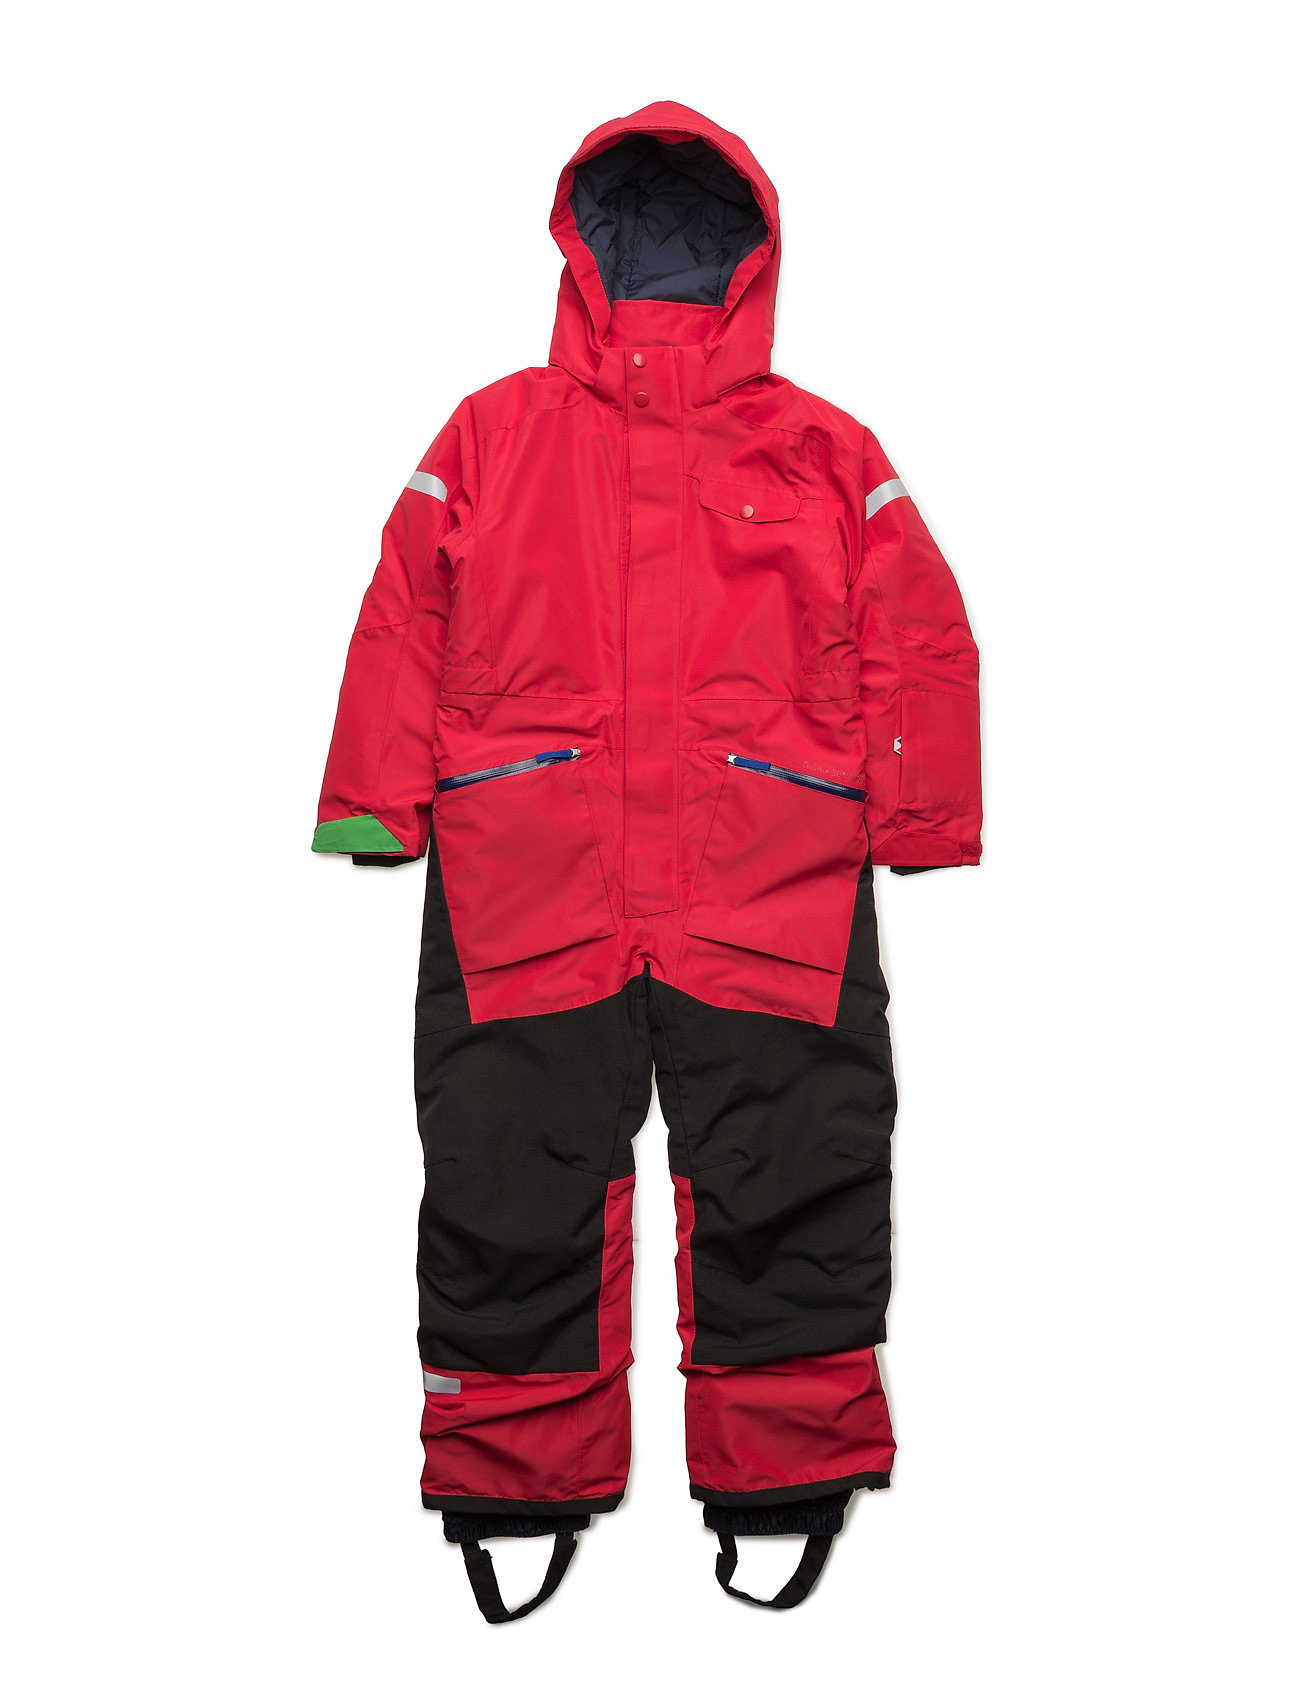 Ale Kids Coverall Didriksons Overalls til Børn i Rød